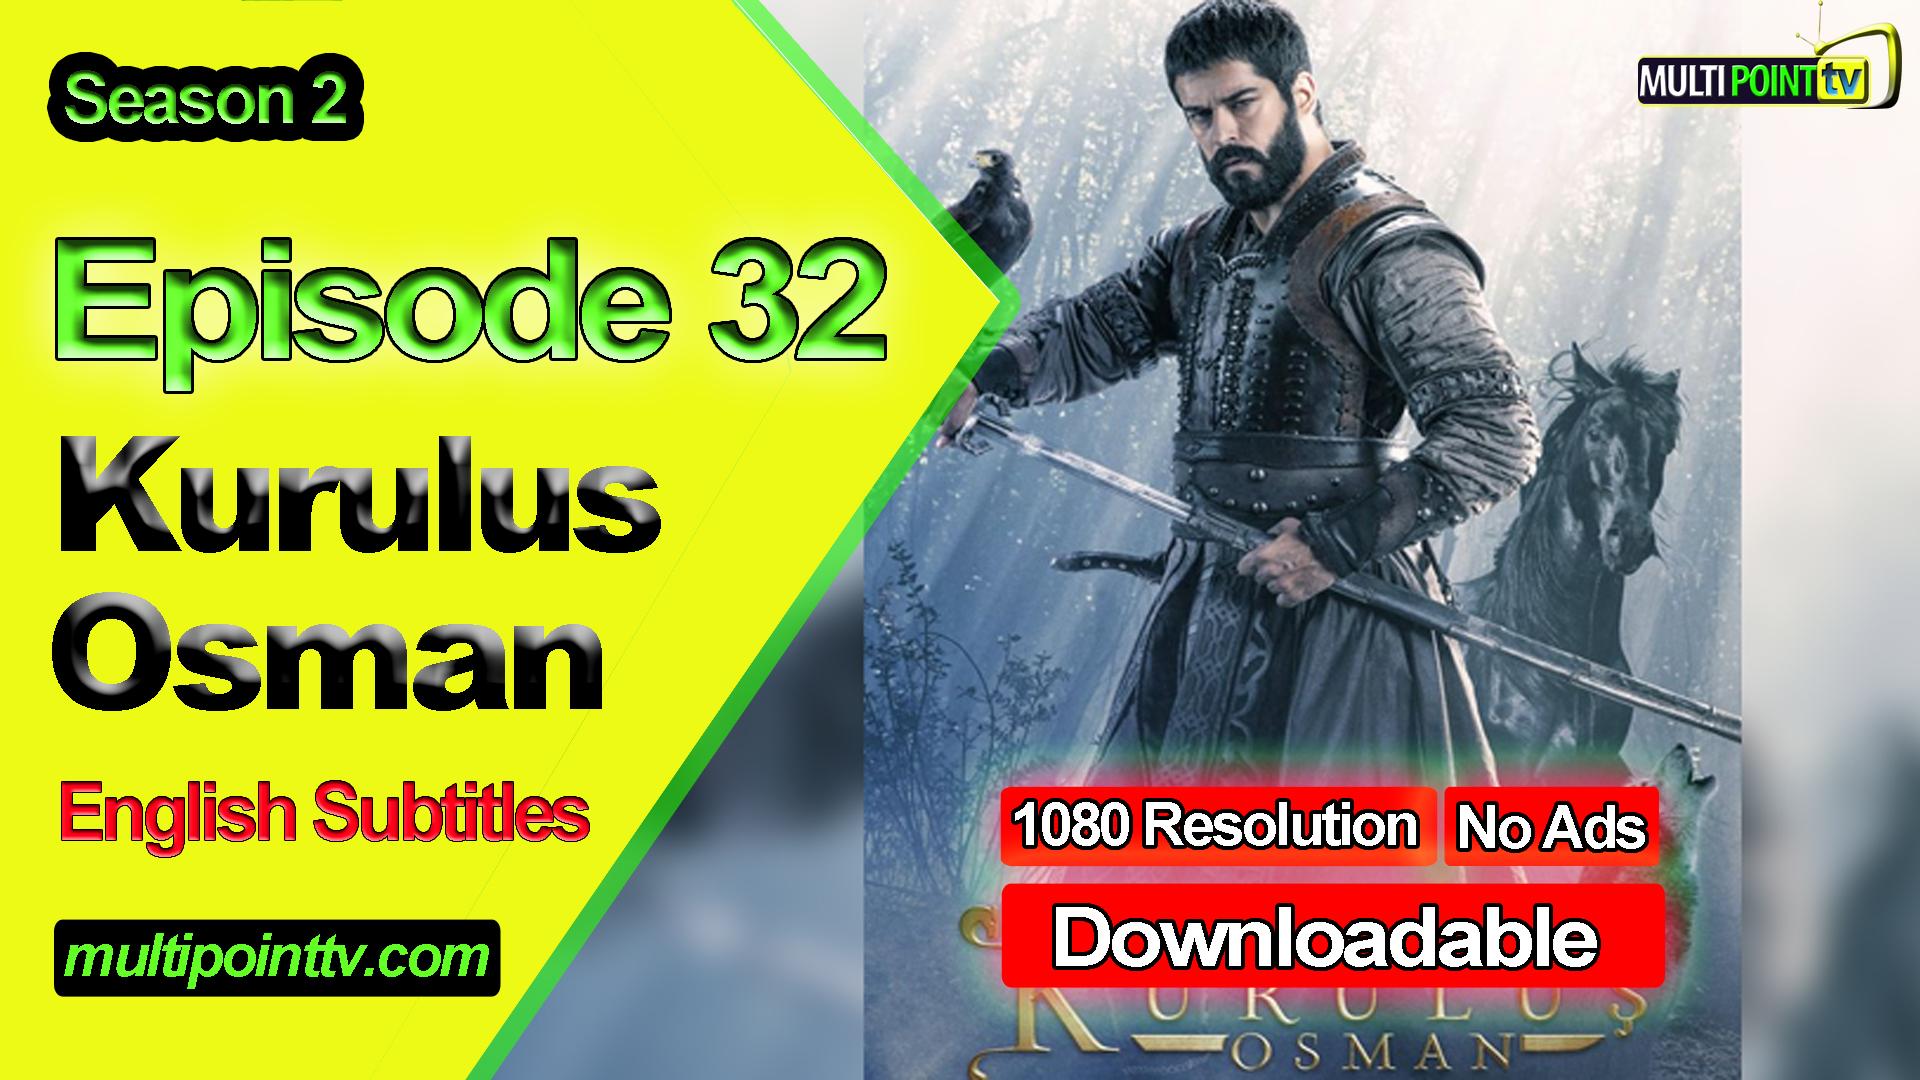 Kurulus Osman Episode 32 English Subtitles